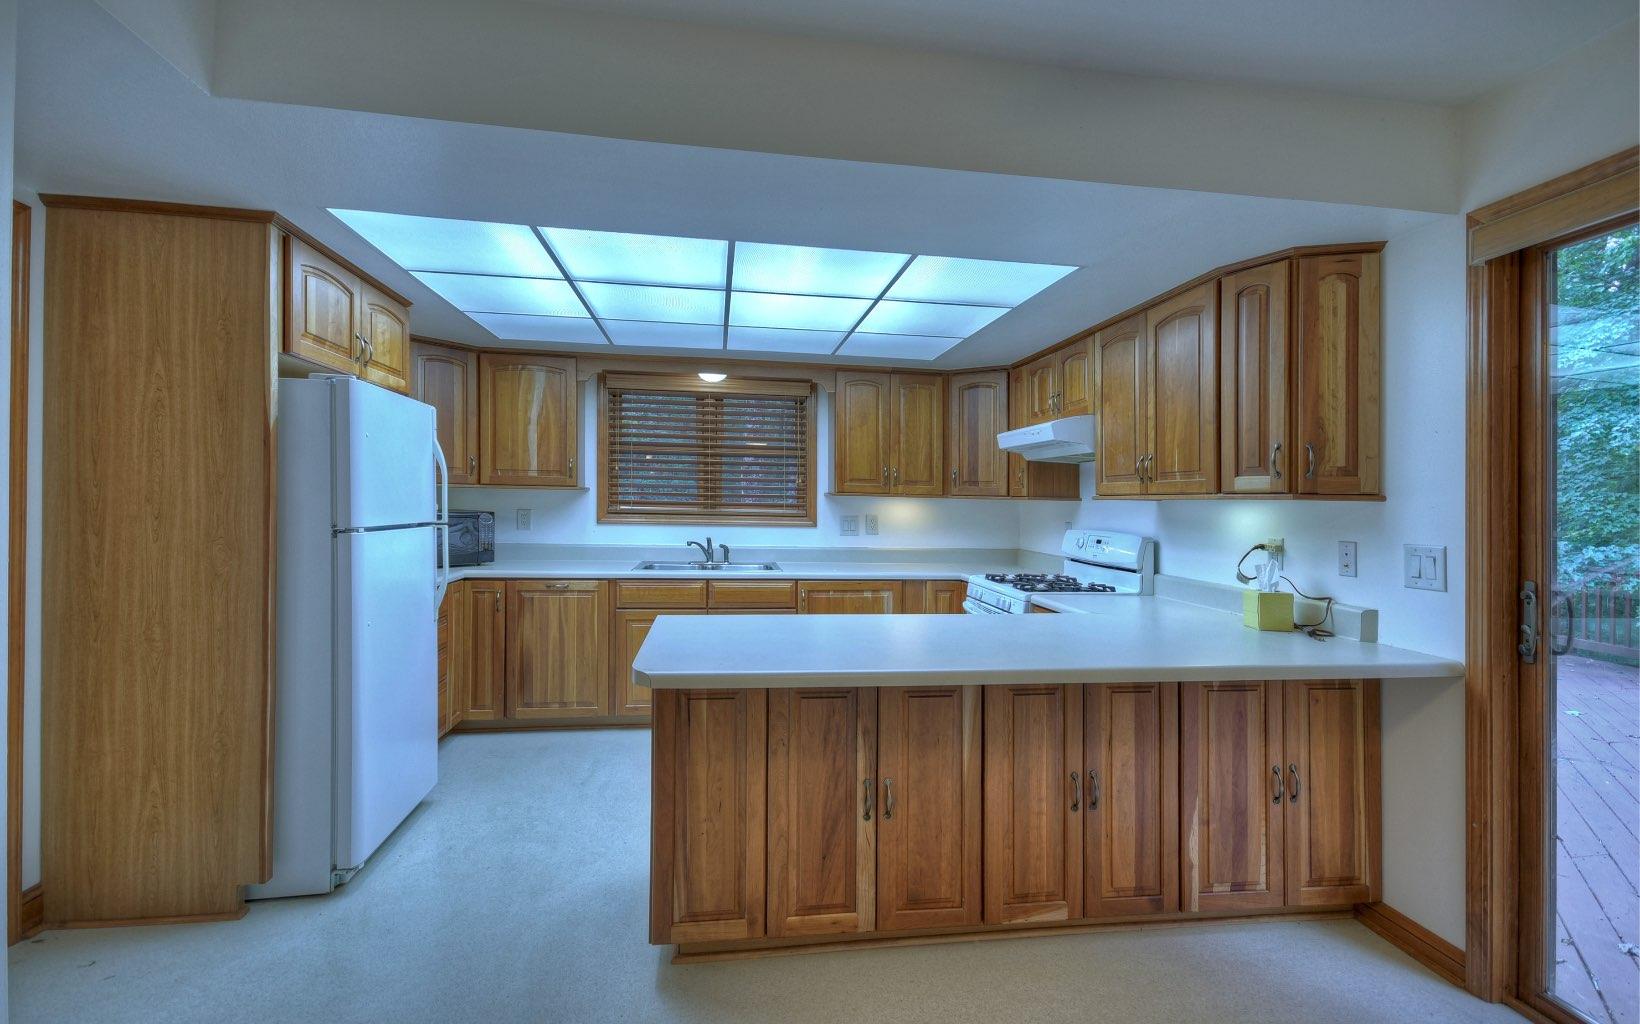 282594 Blue Ridge Residential